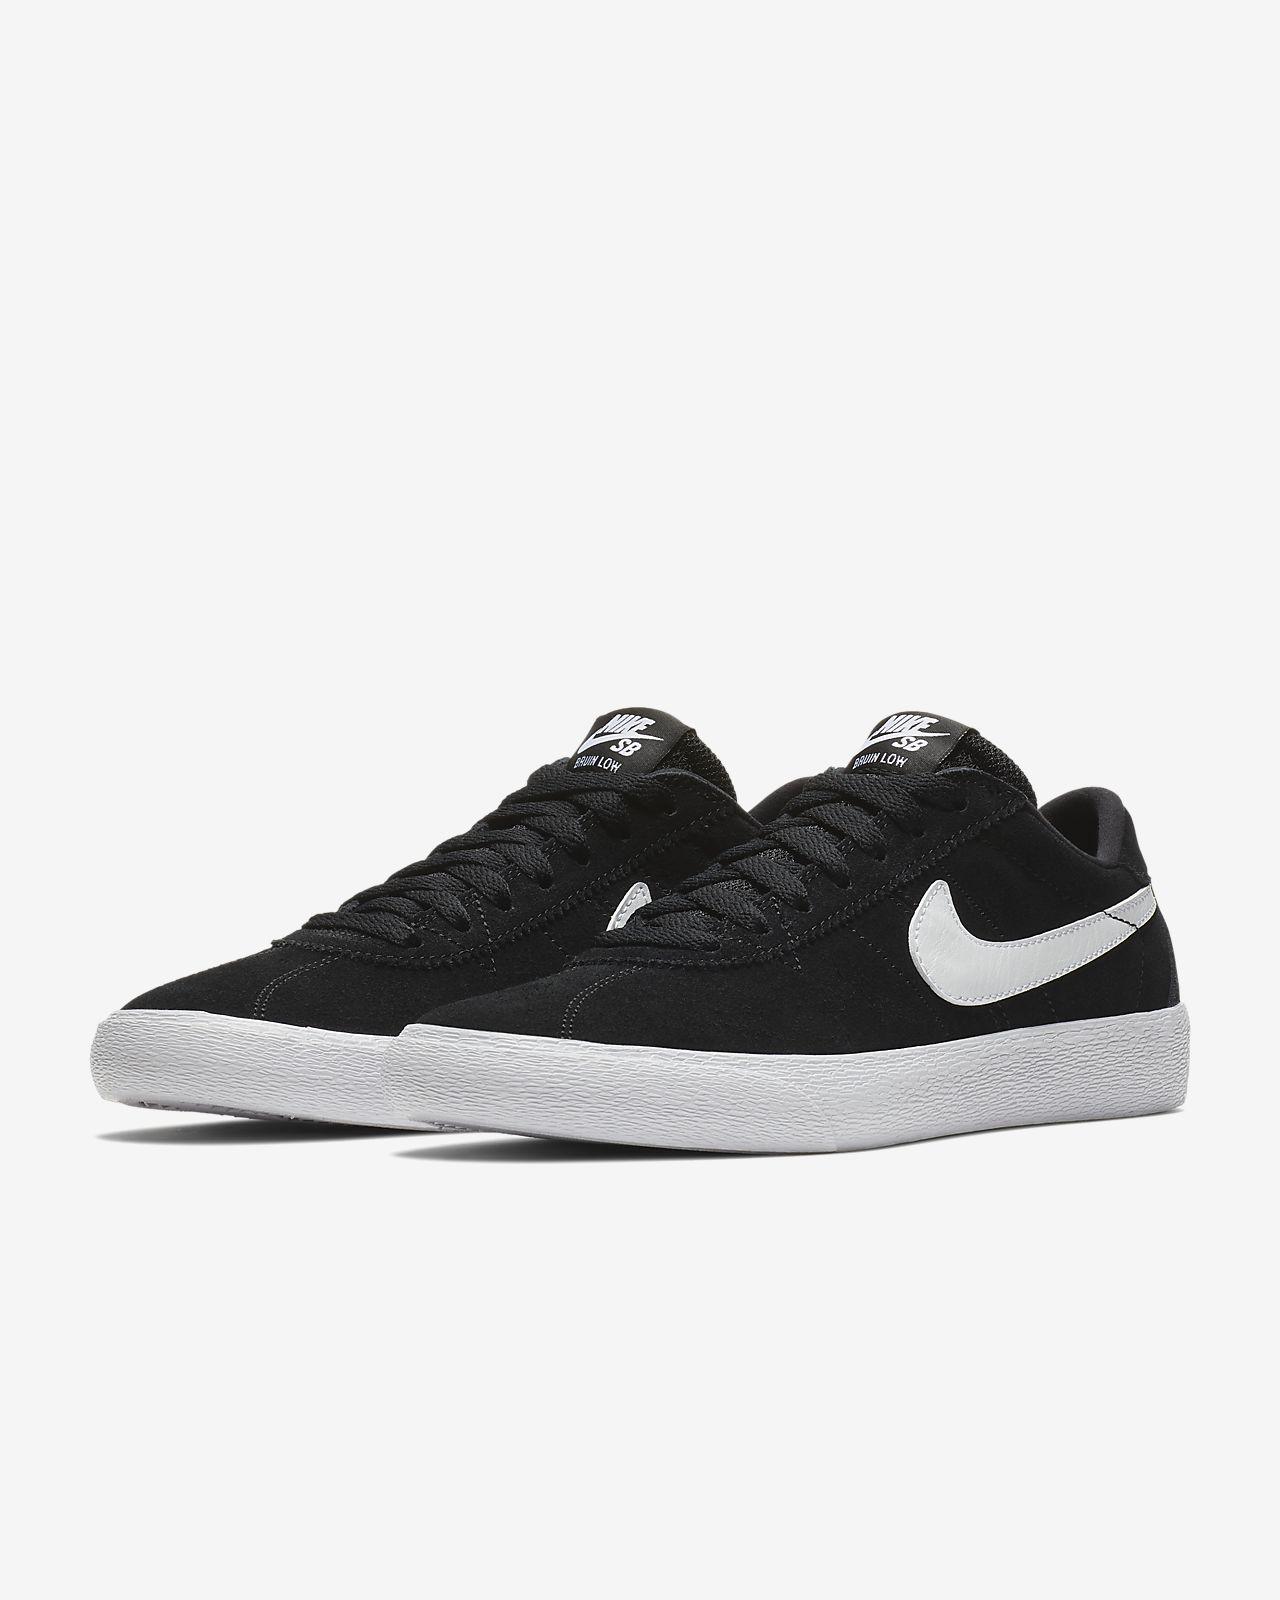 9cfc8067bd5e9 Nike SB Zoom Bruin Low Women's Skateboarding Shoe